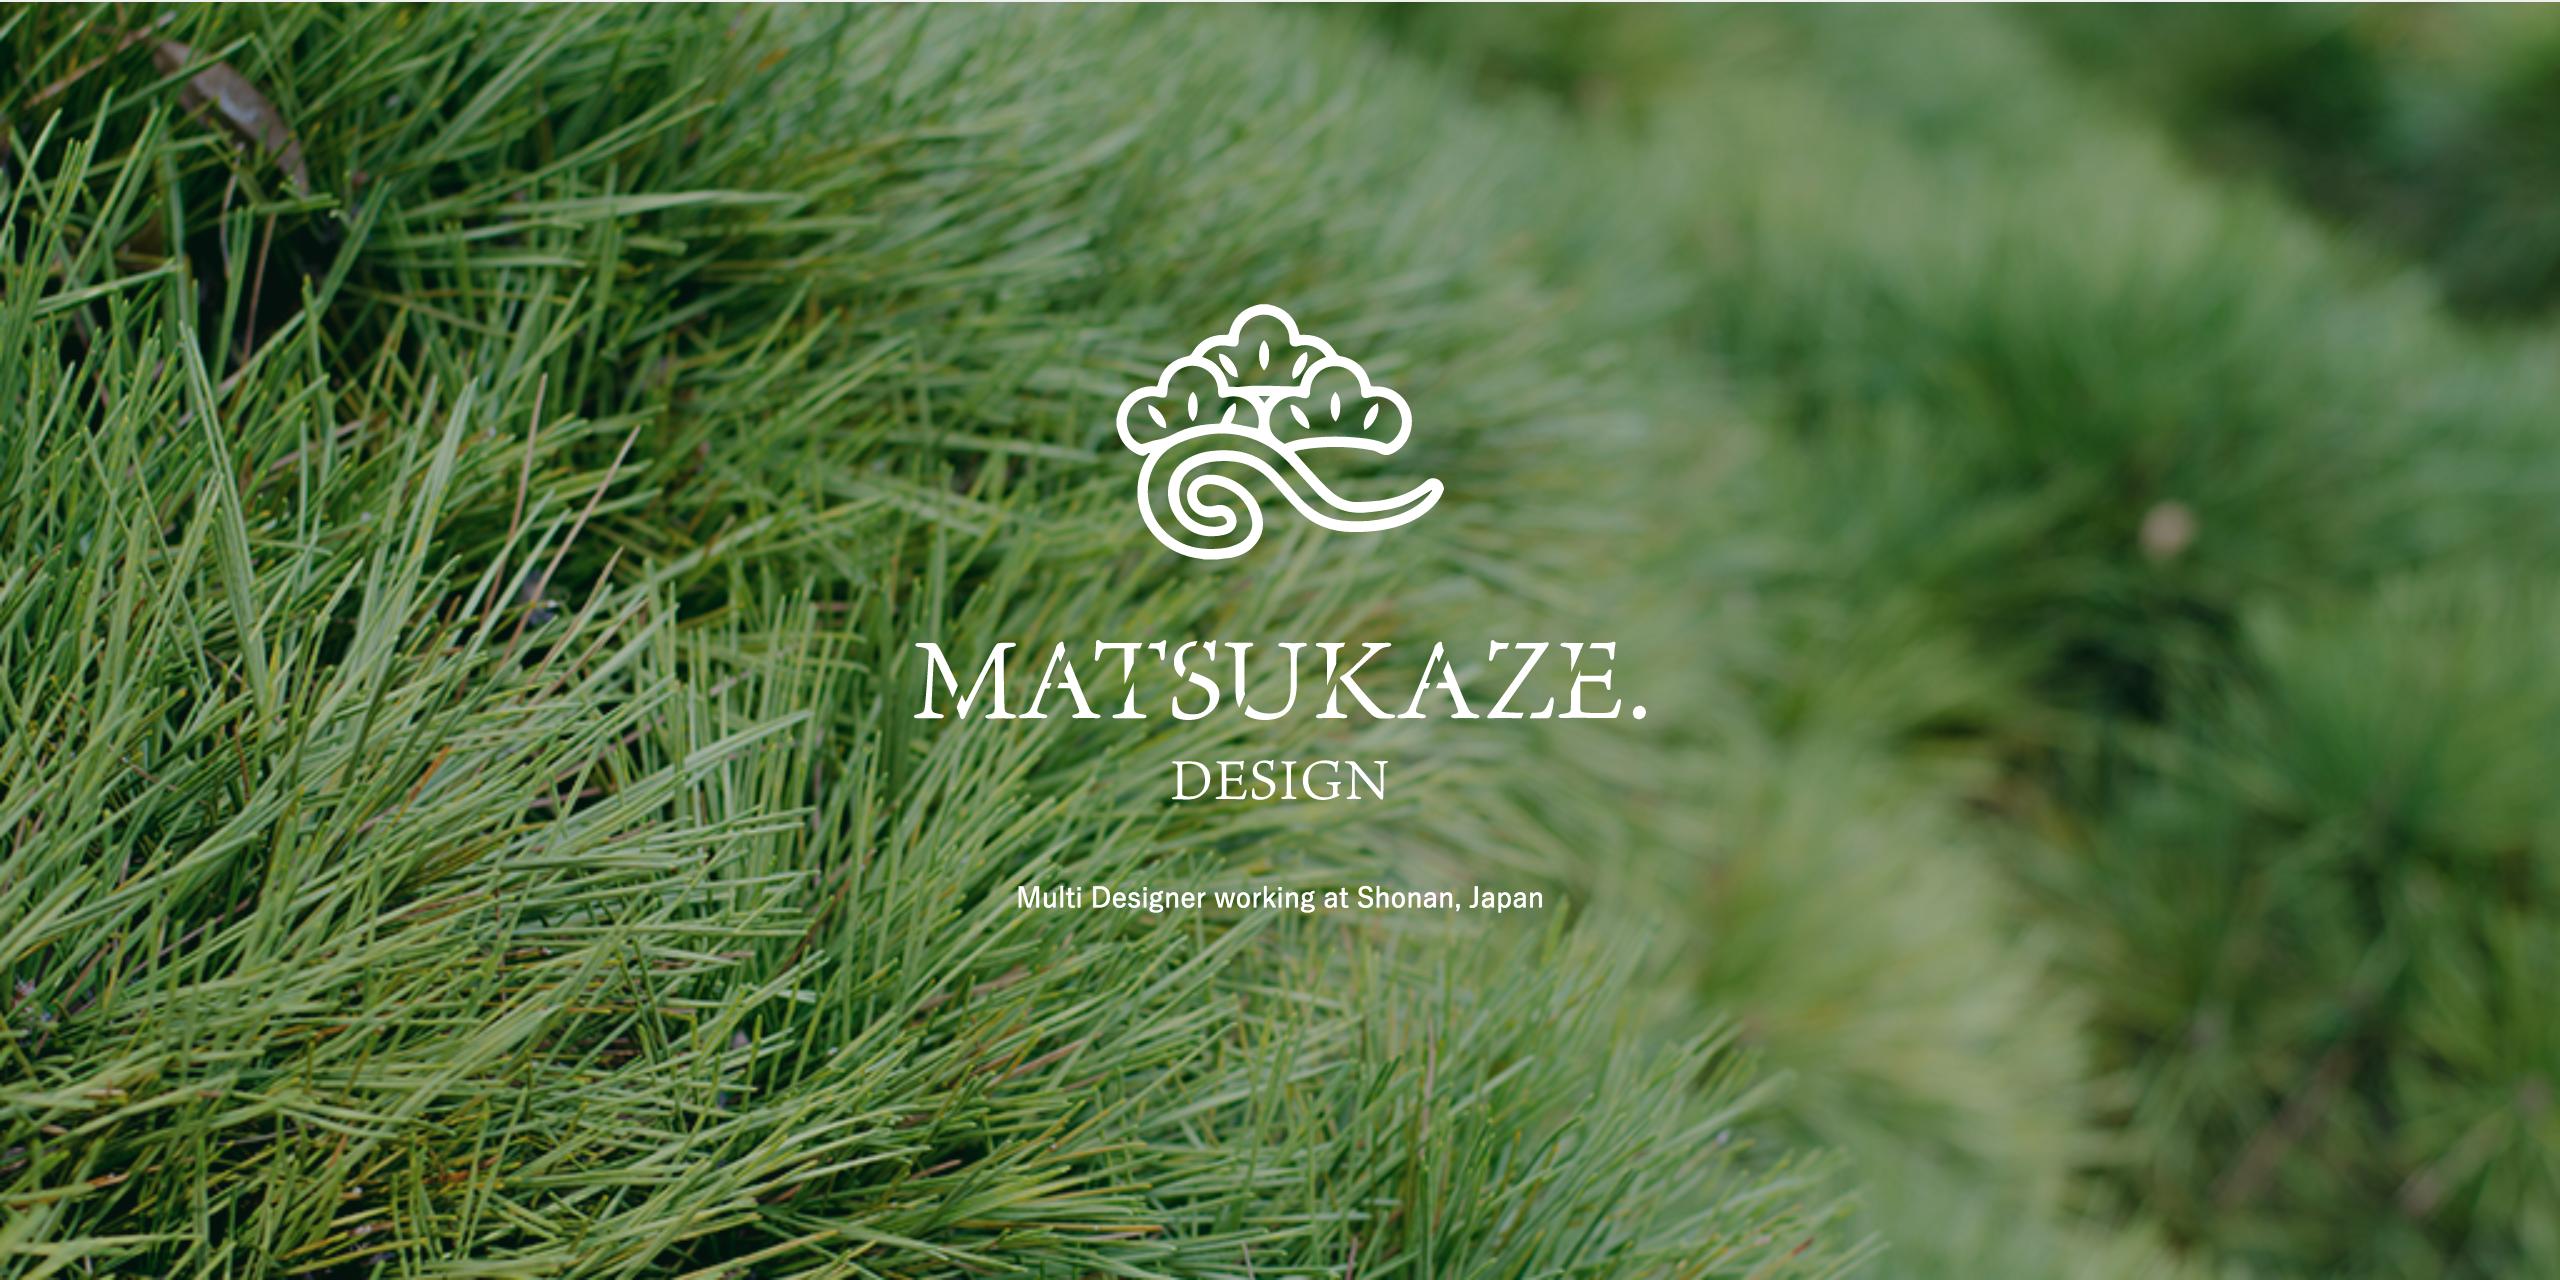 MATSUKAZE.design